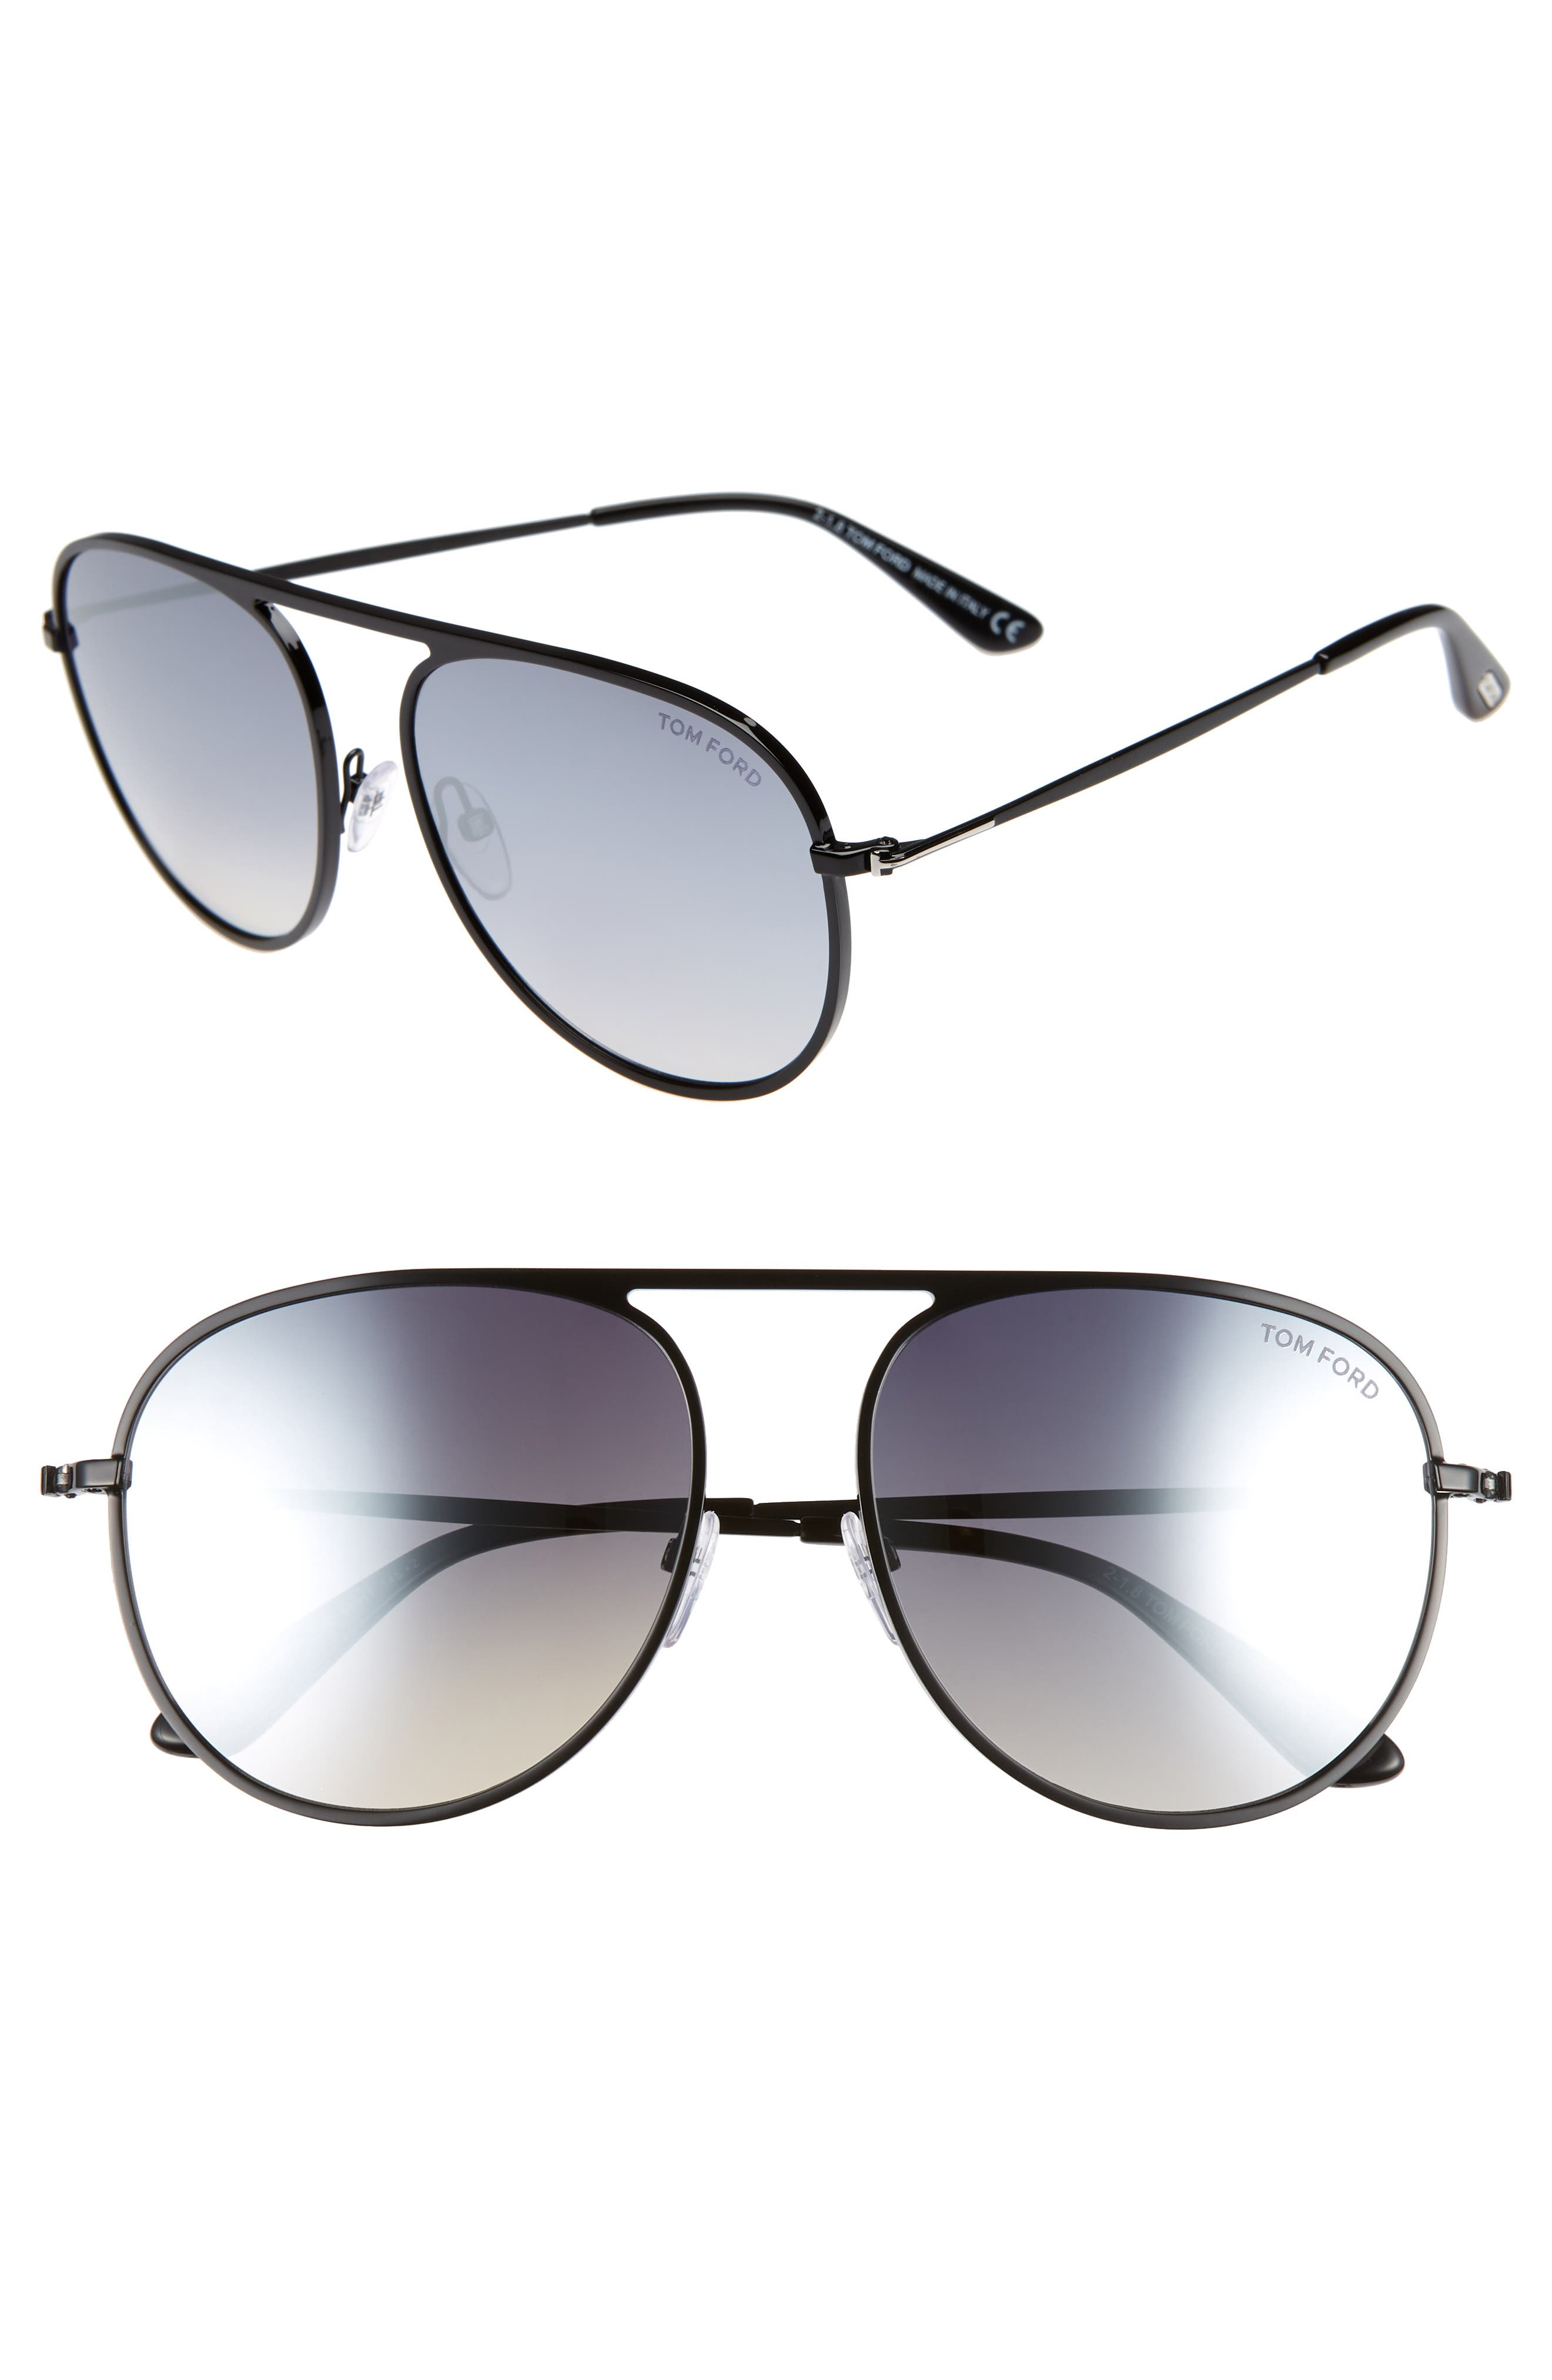 59mm Aviator Sunglasses,                         Main,                         color, SHINY BLACK/ SMOKE MIRROR